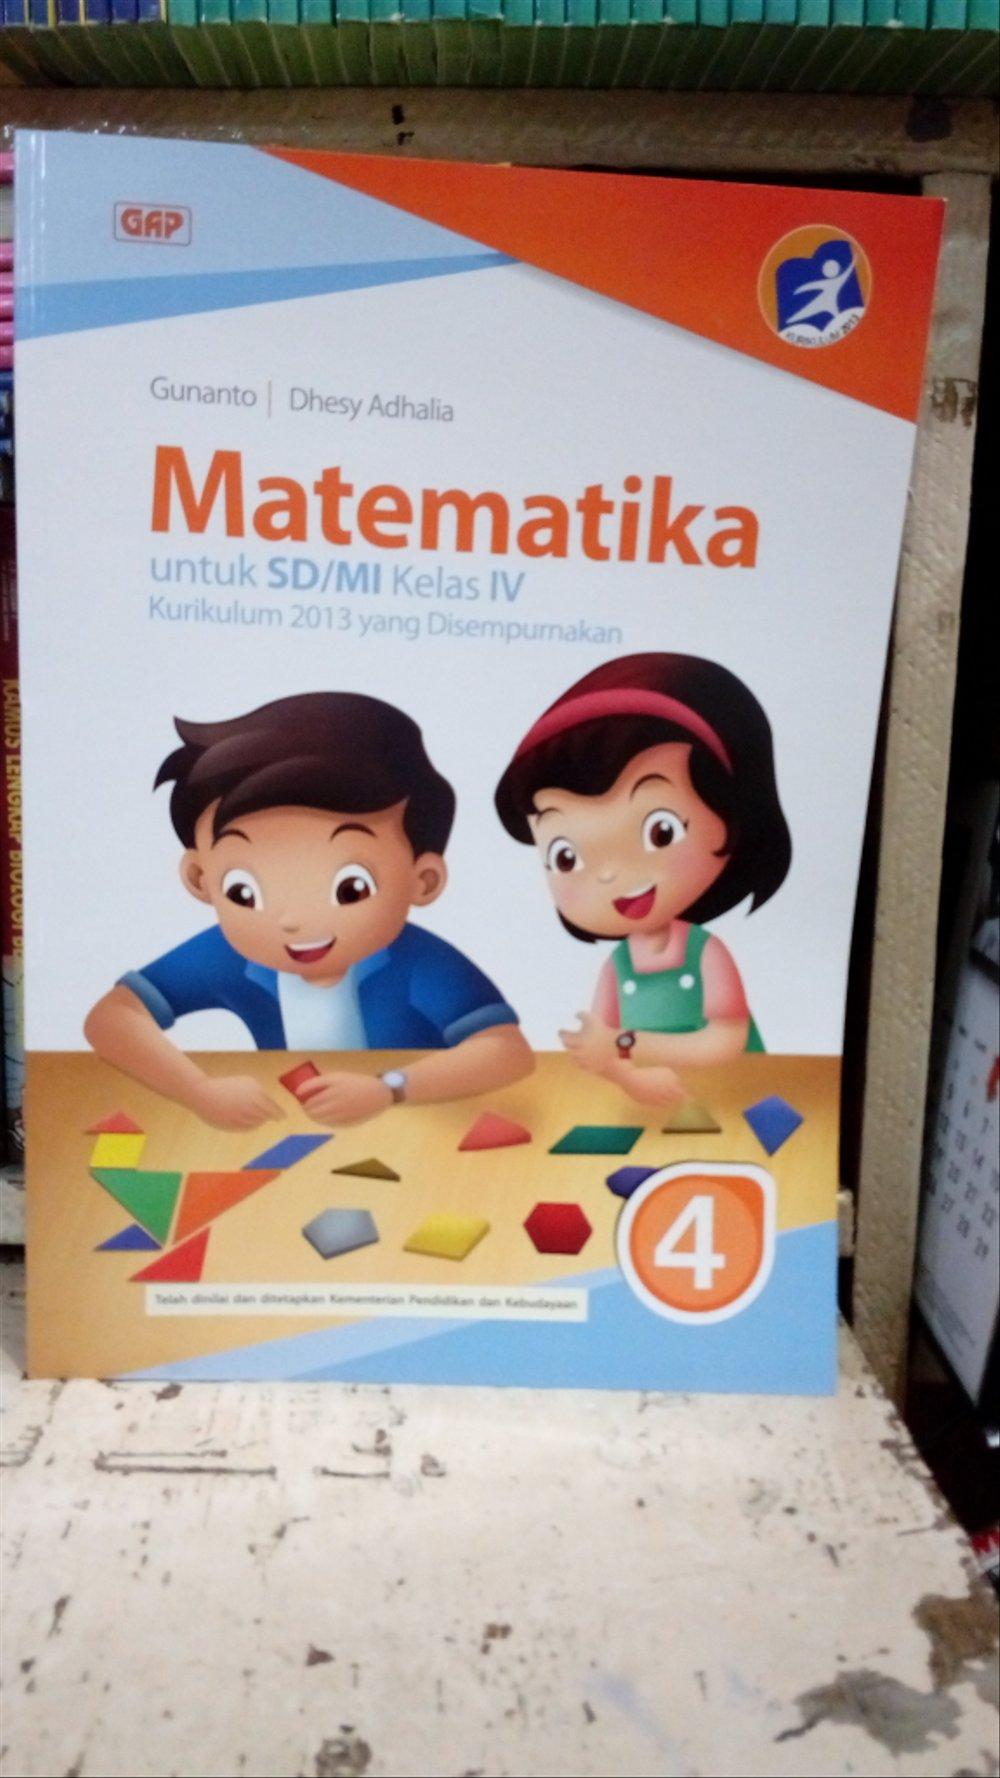 16/06/2021· buku esps matematika sd mi kelas 5 k2013 erlangga kunci jawaban buku senang belajar matematika kelas 5 pembahasan matematika esps kelas 5 kecepatan dan debit. Buku Erlangga Kelas 4 Sd Kurikulum 2013 - Dunia Sekolah ID